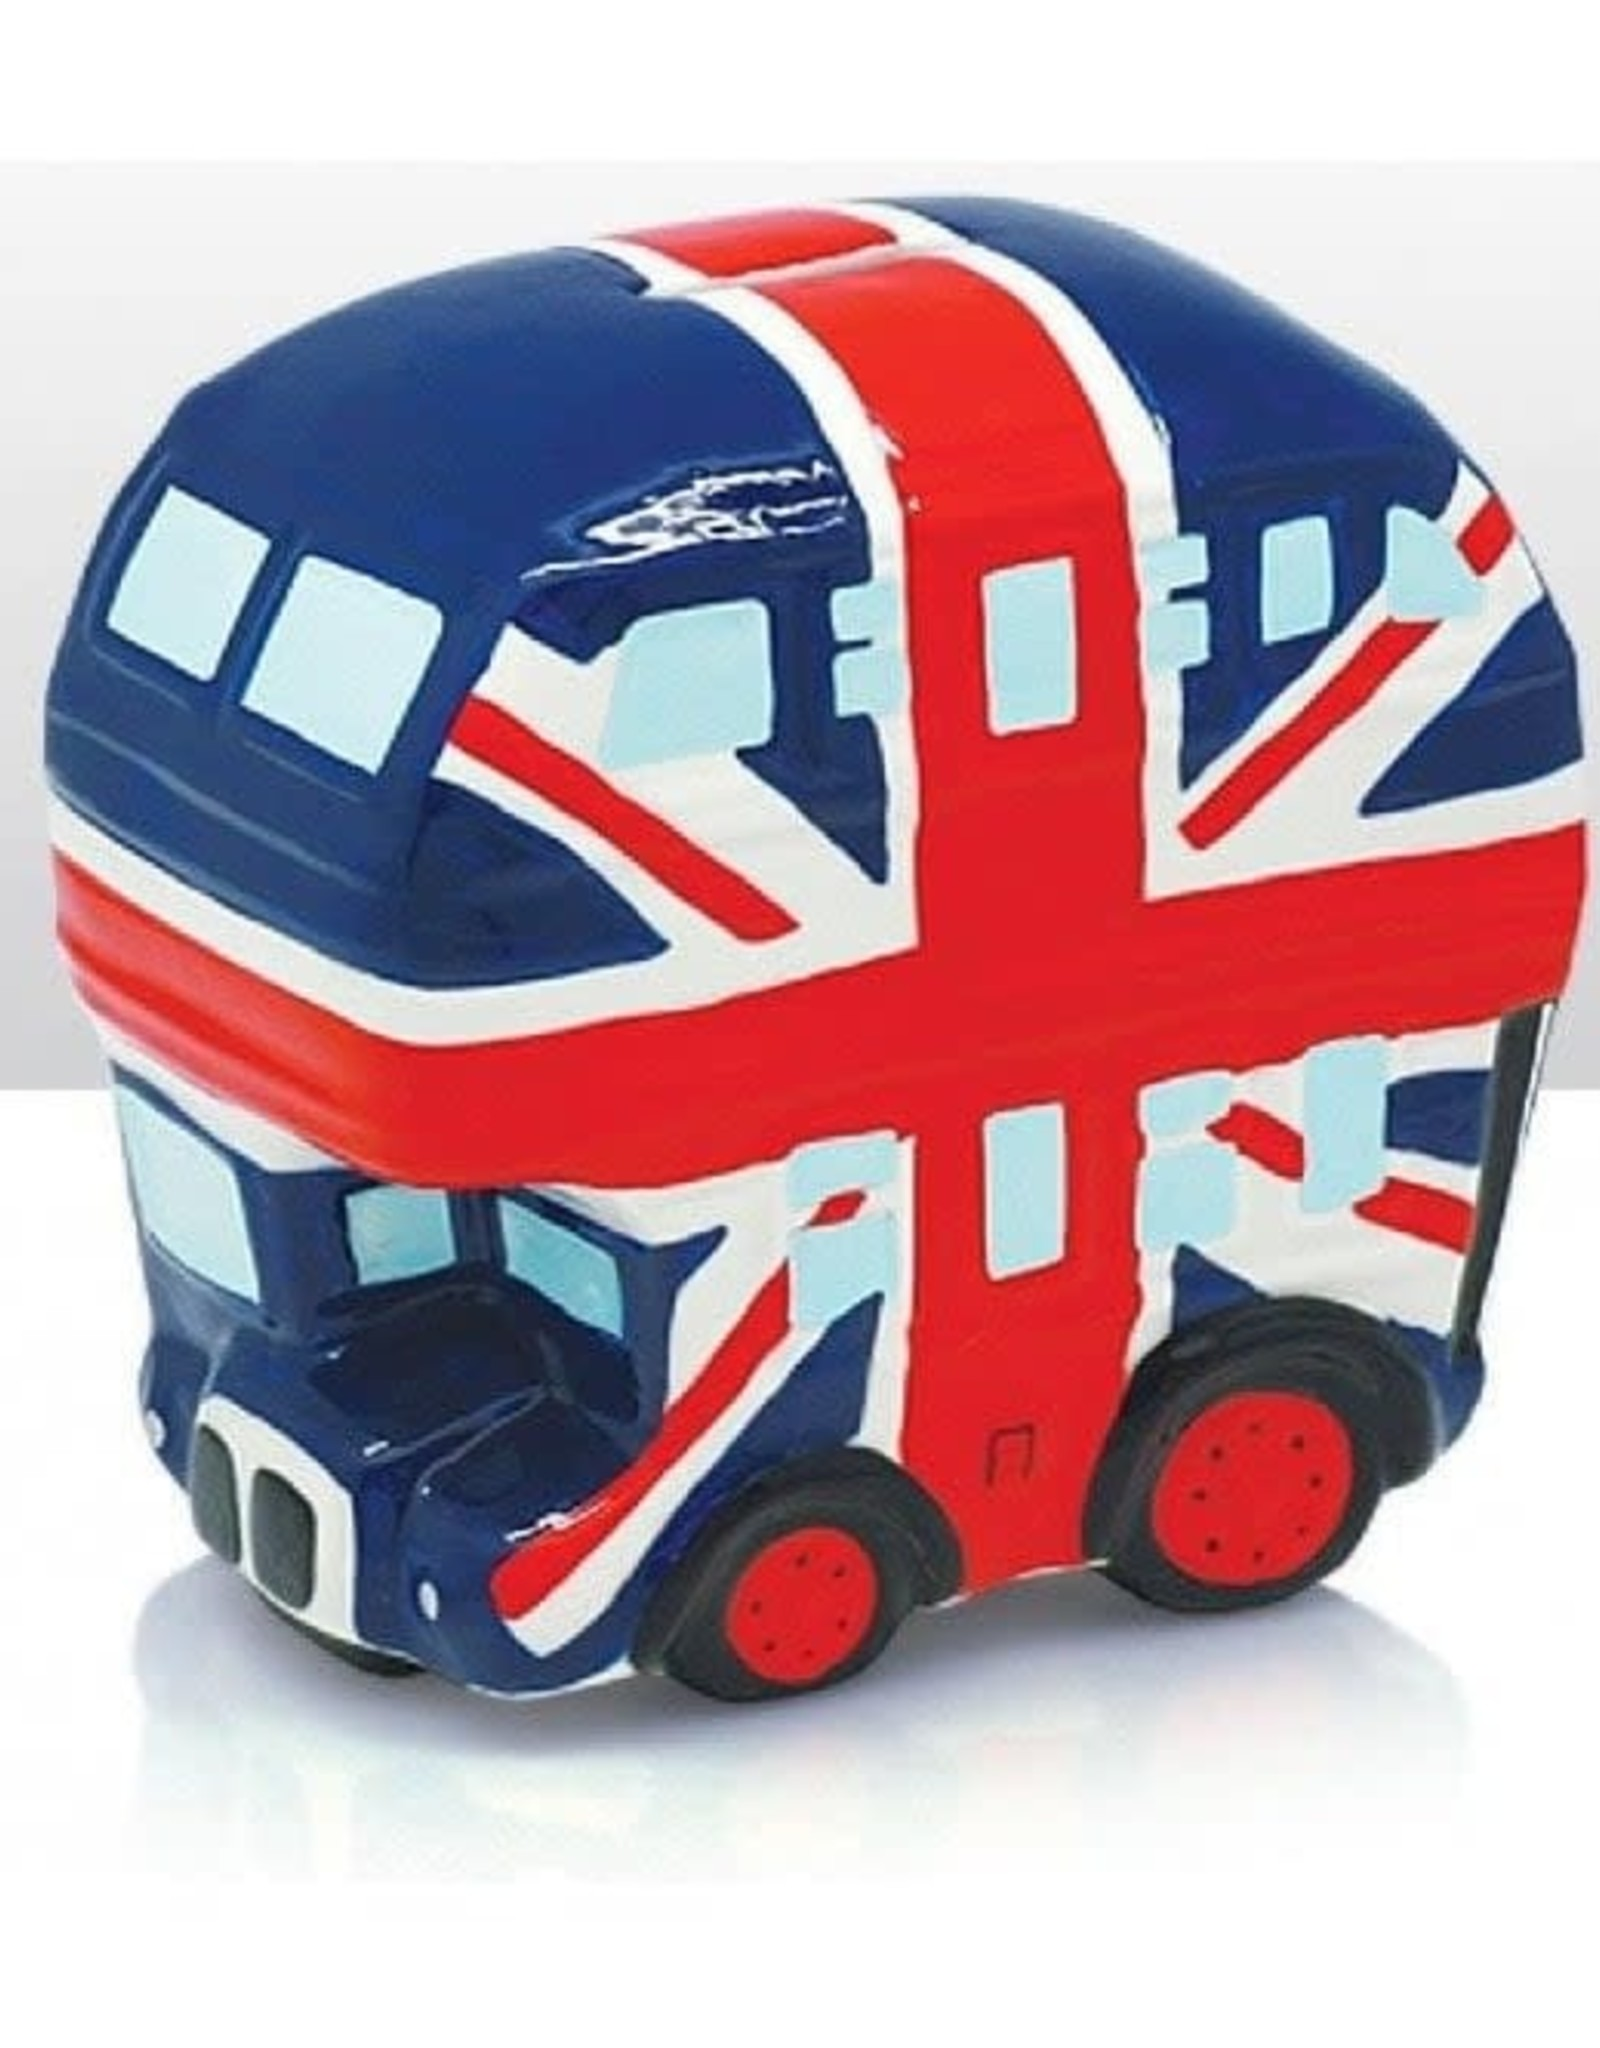 Elgate Union Jack Bus Moneybox